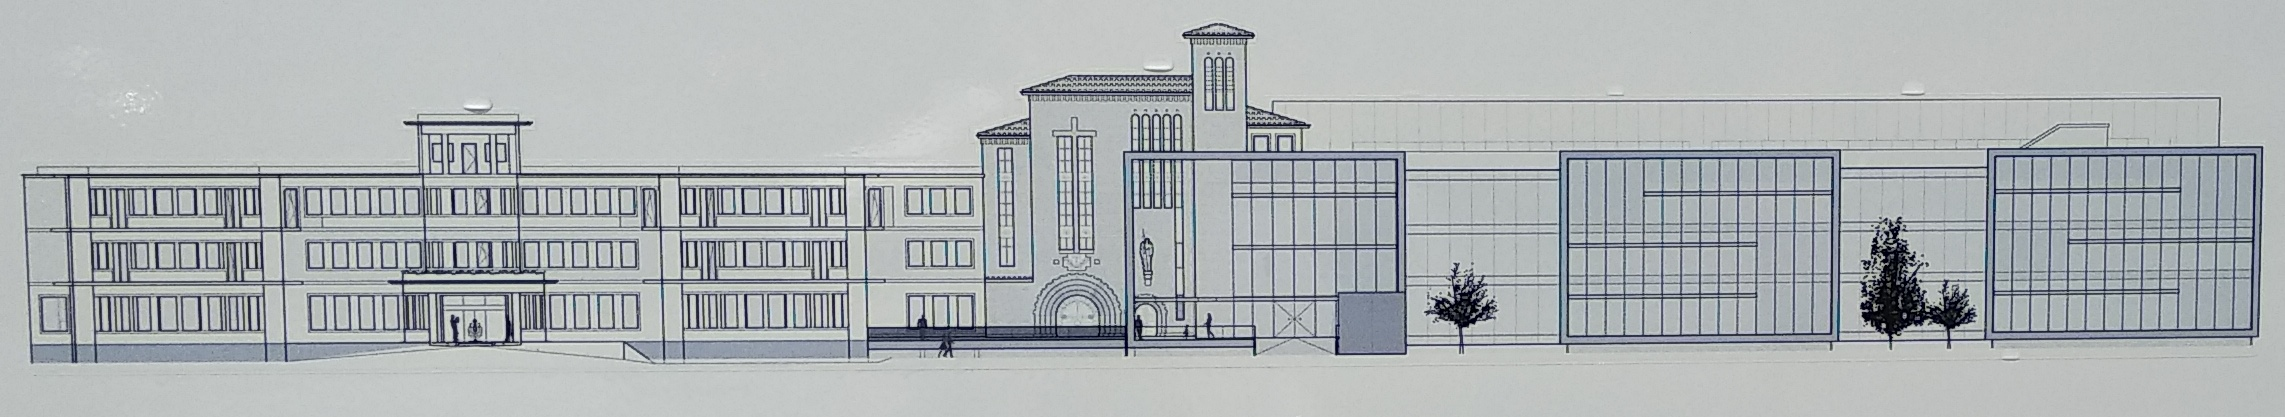 dibujo de la fachada del hospital